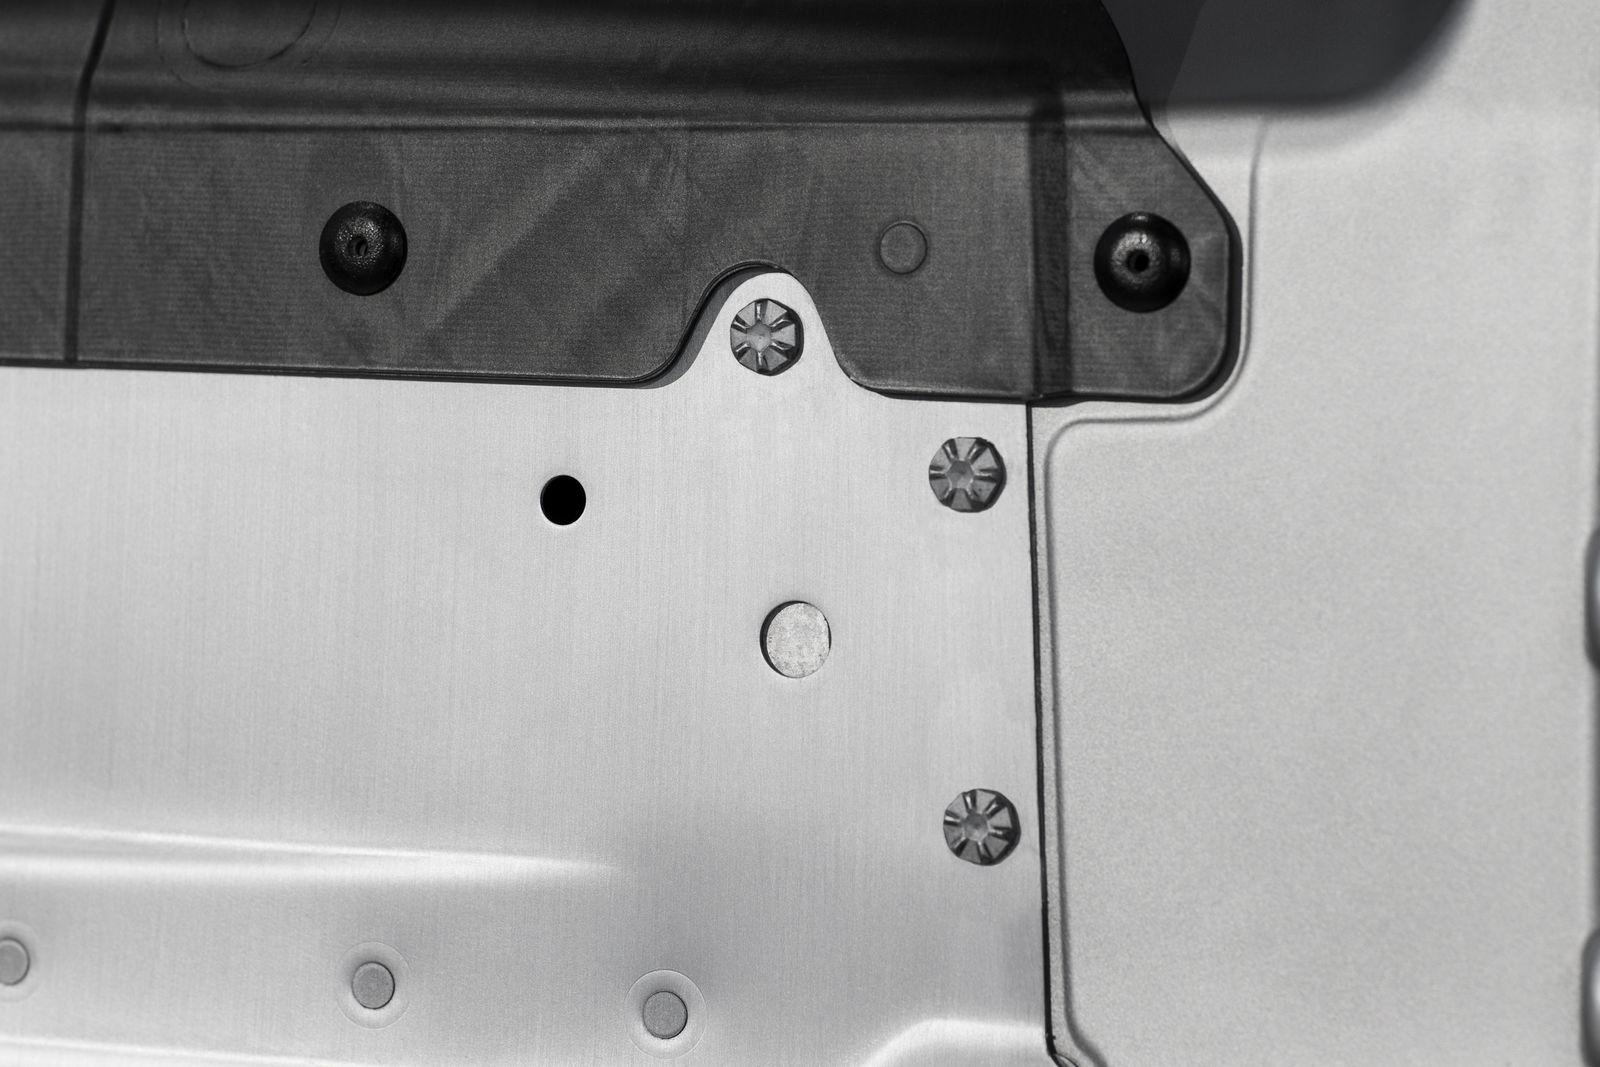 Mix of materials at the next Audi A8